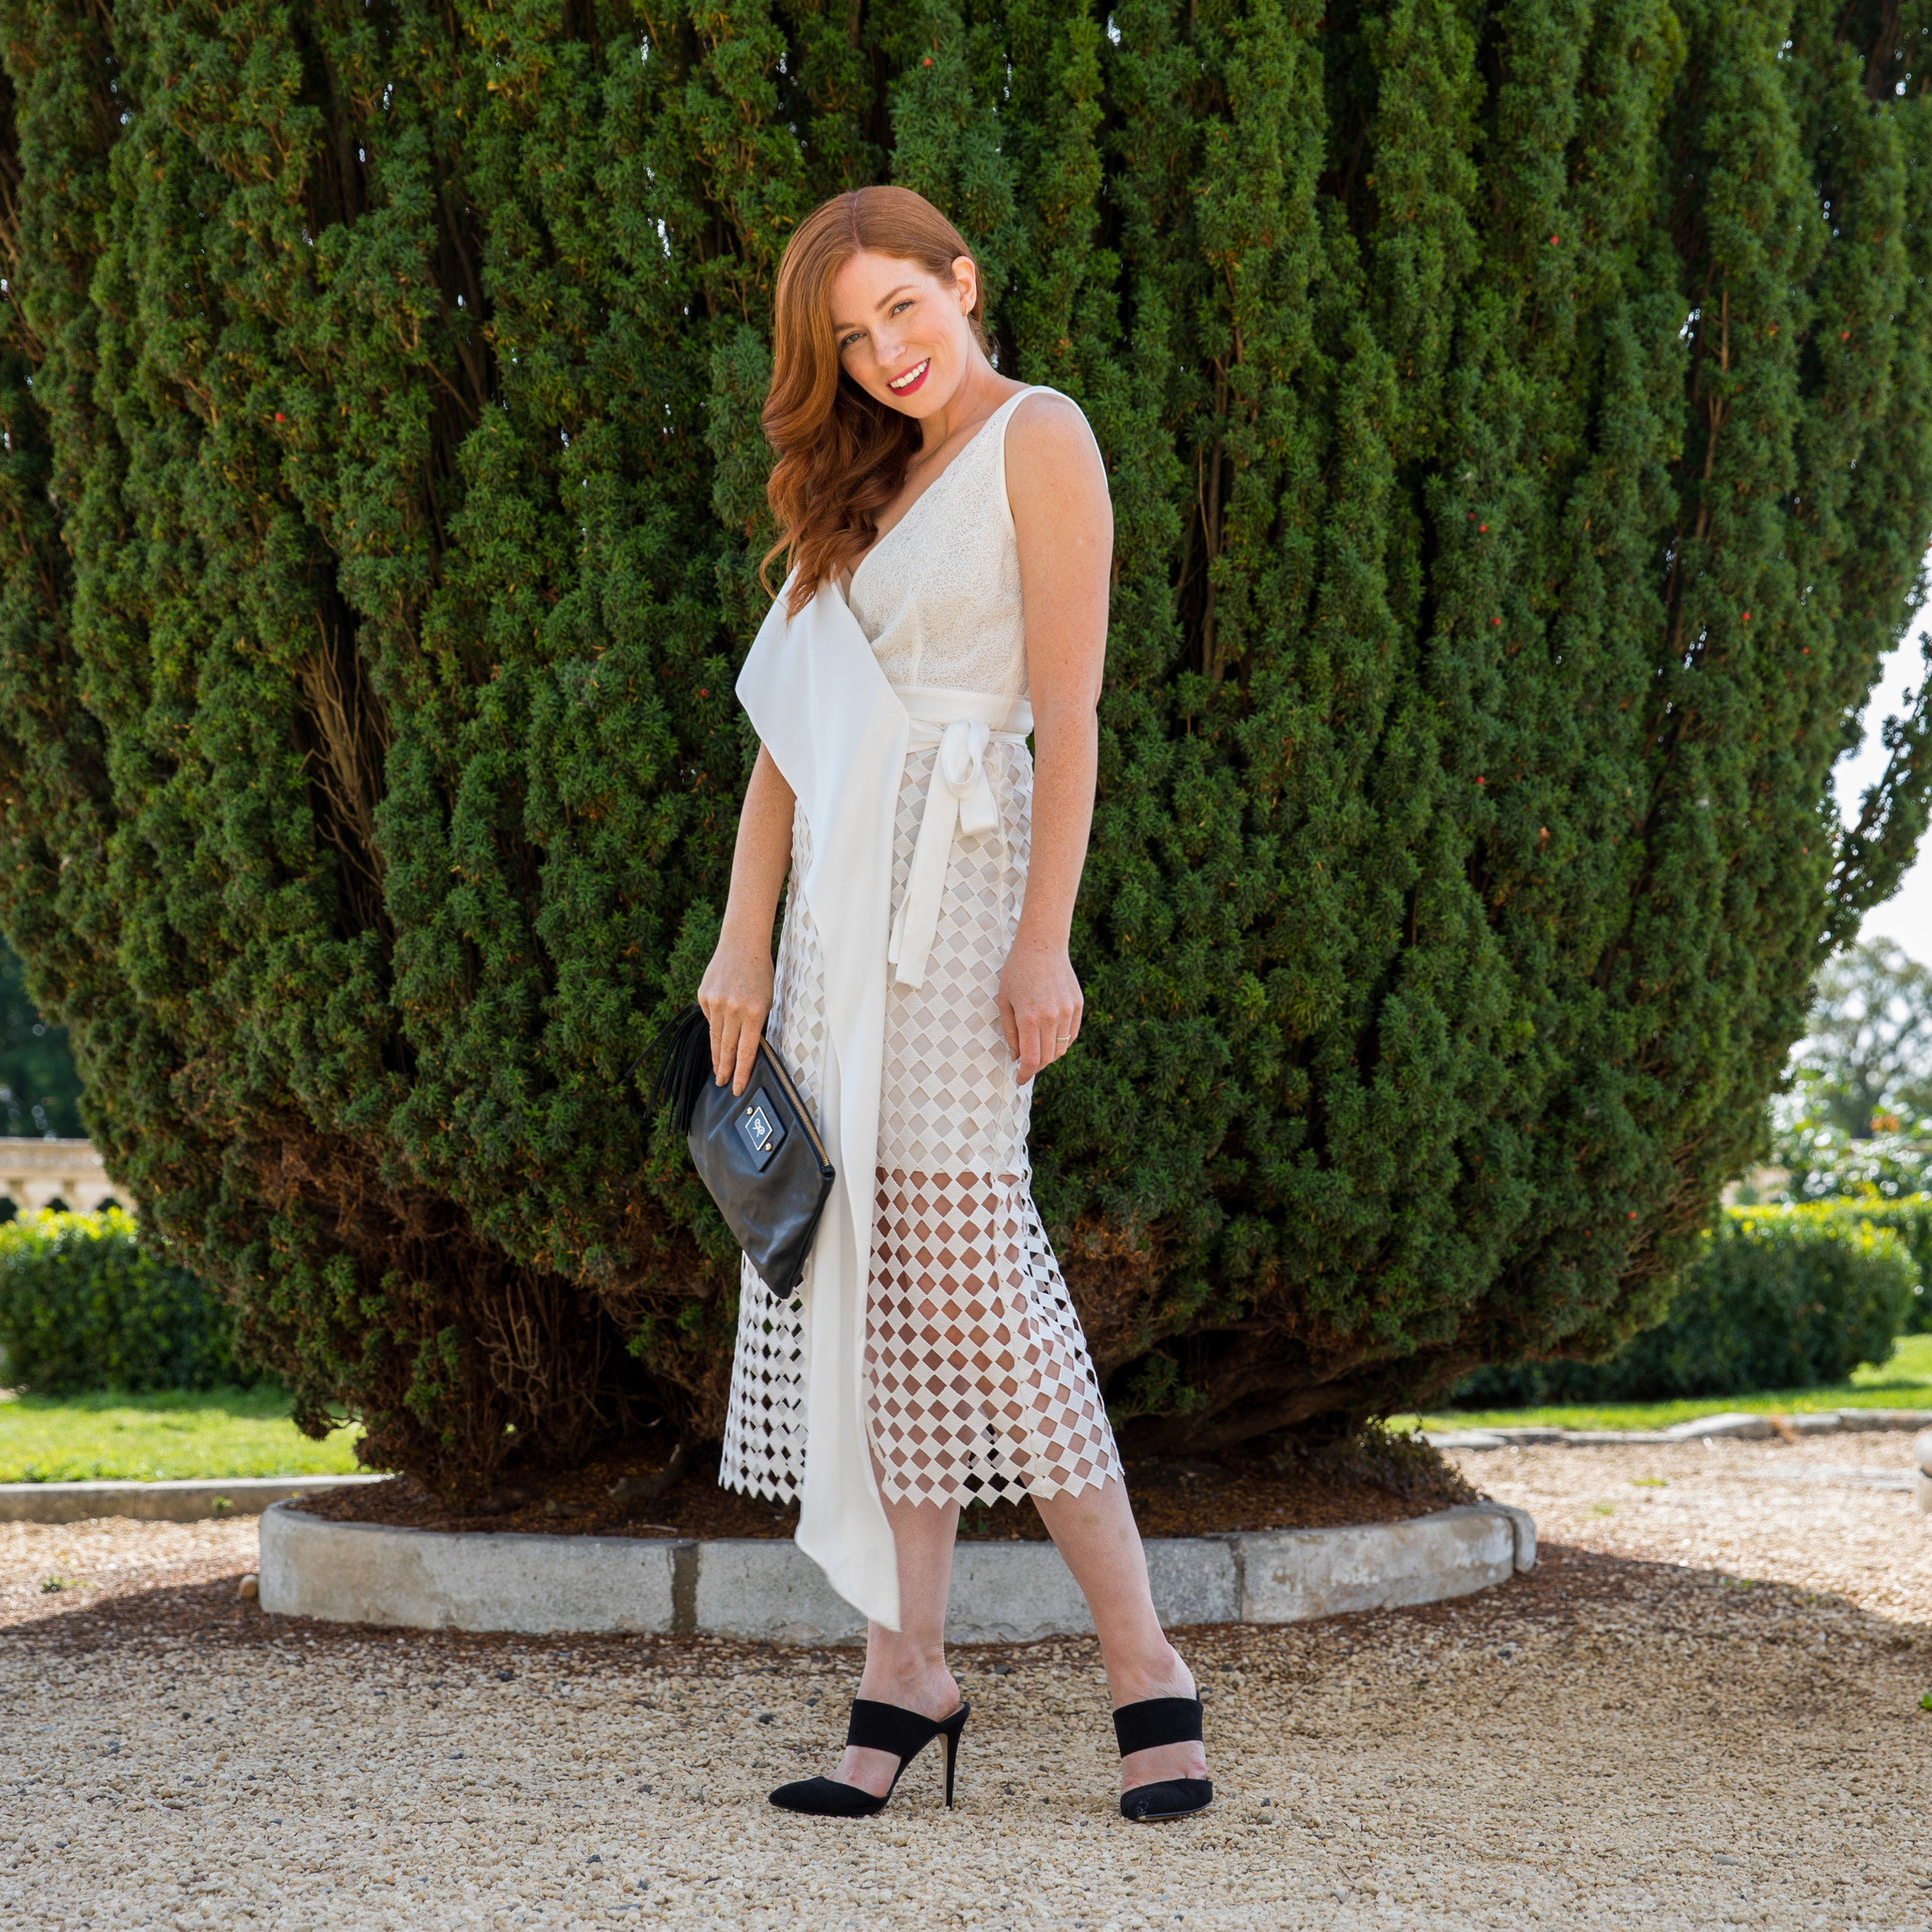 DVF Dress: Original Price £485 - Sample Sale Price £100